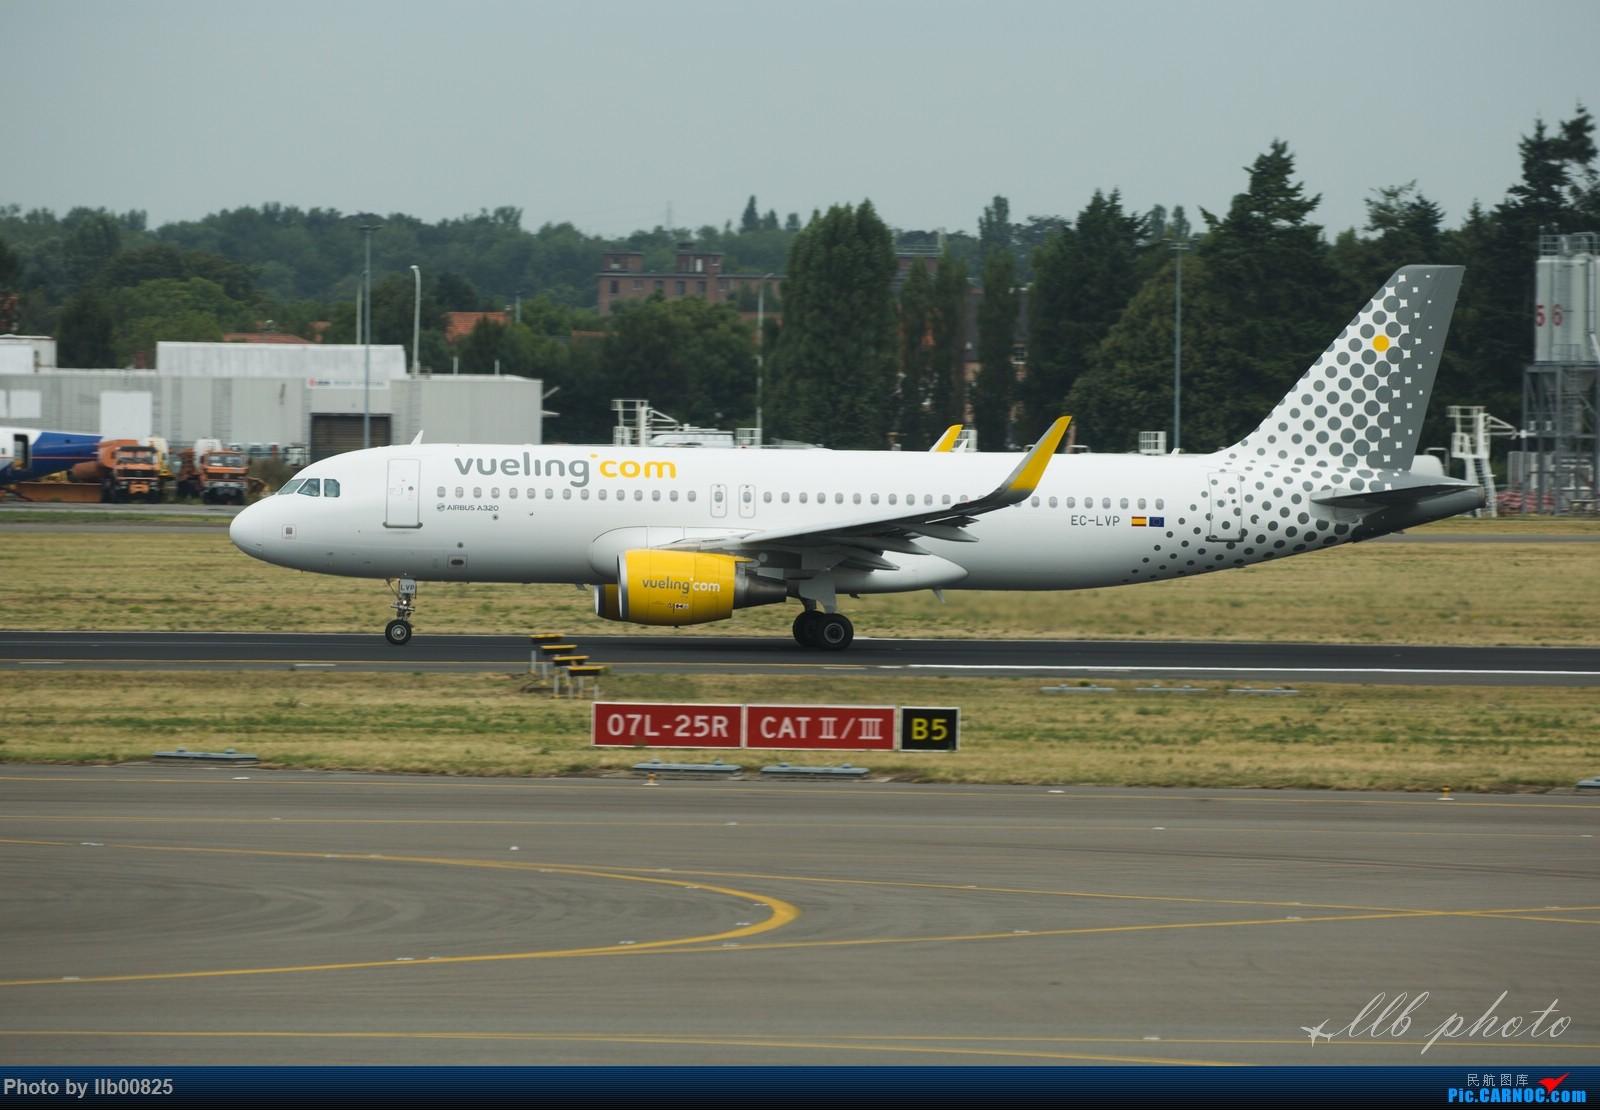 Re:[原创]赫尔辛基-布鲁塞尔一些杂图 AIRBUS A320 EC-LVP 比利时布鲁塞尔机场